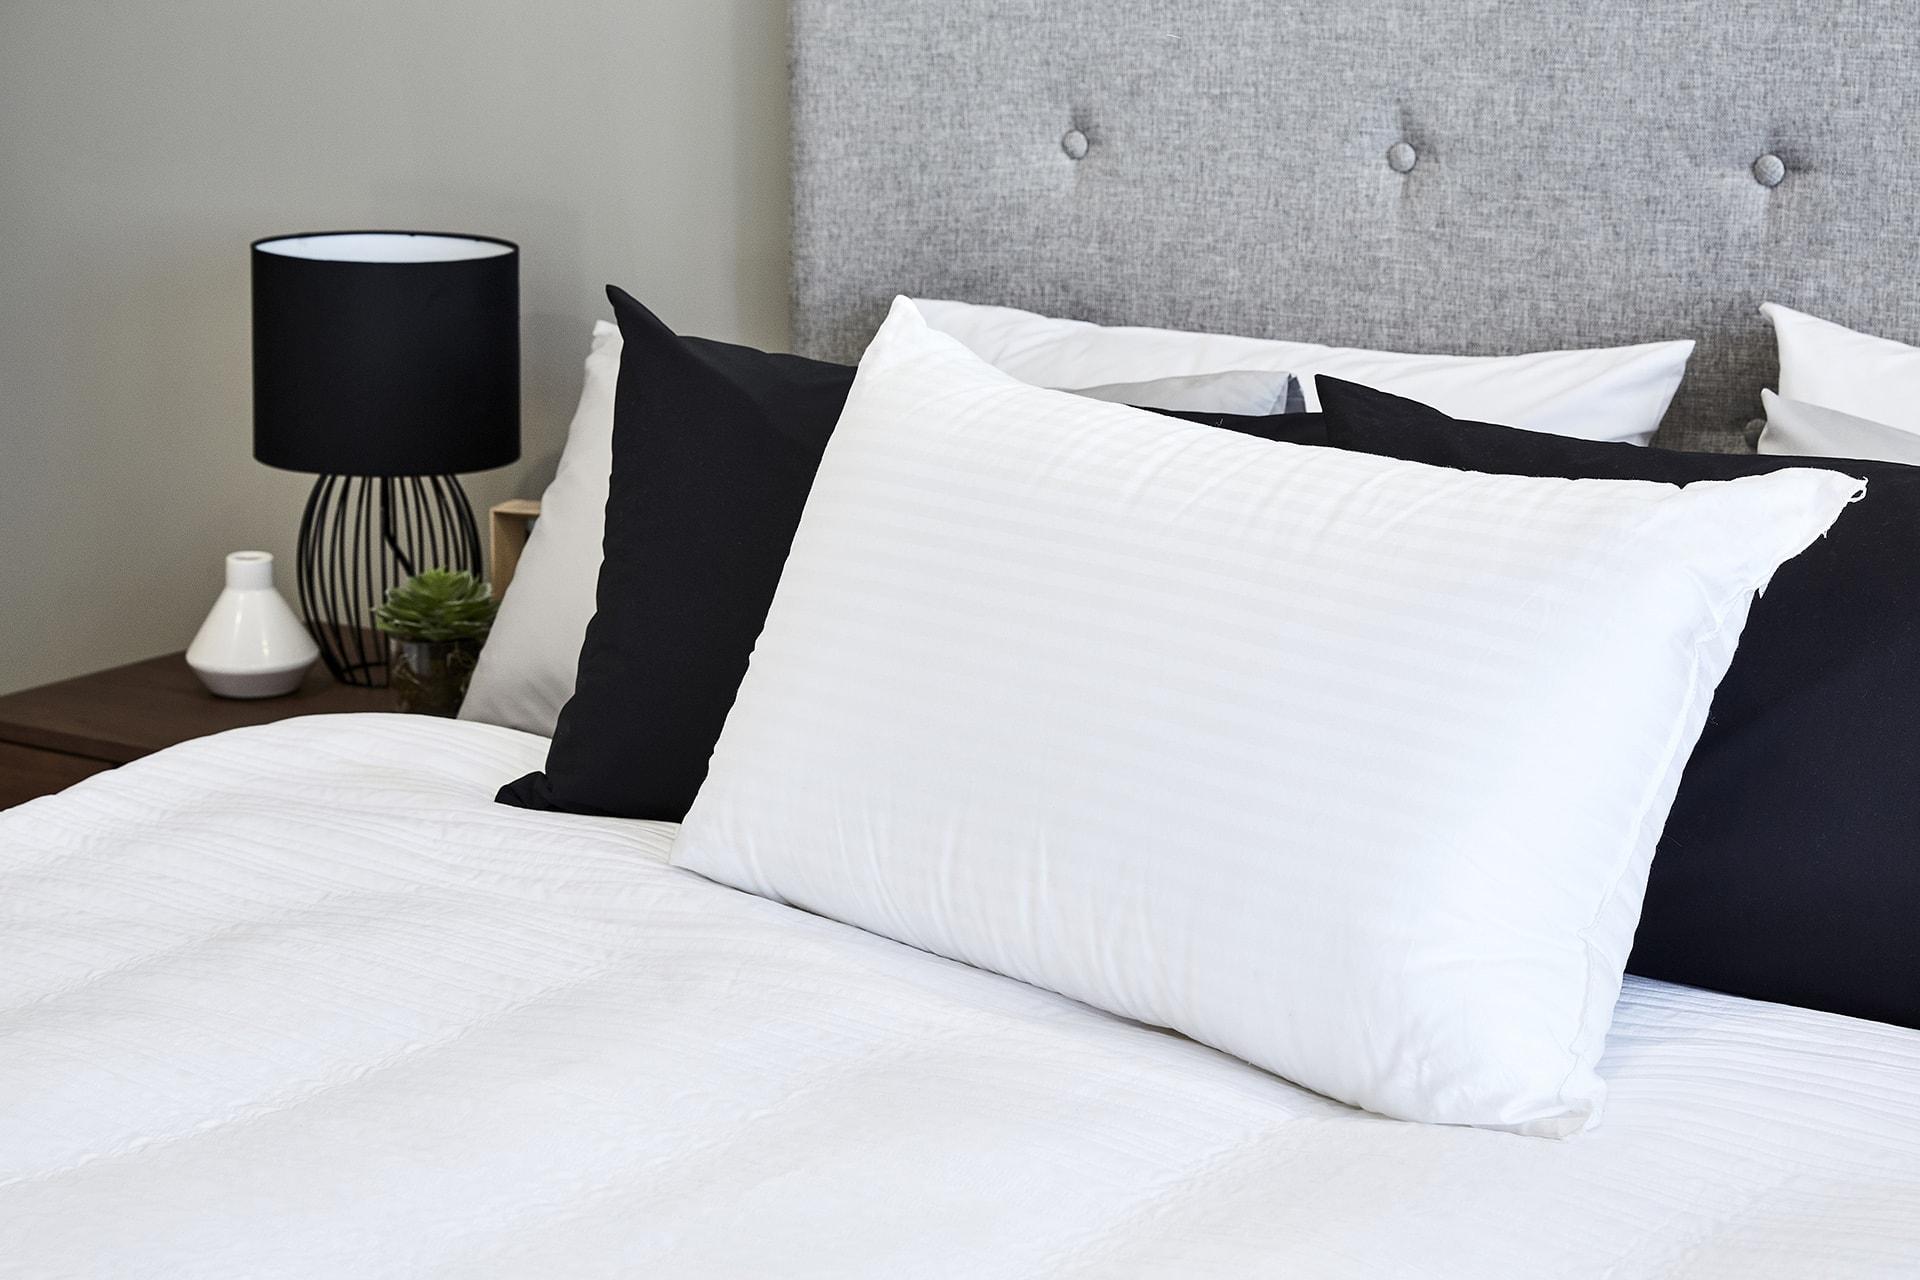 lorraine lea posture sleep pillow different types of pillows